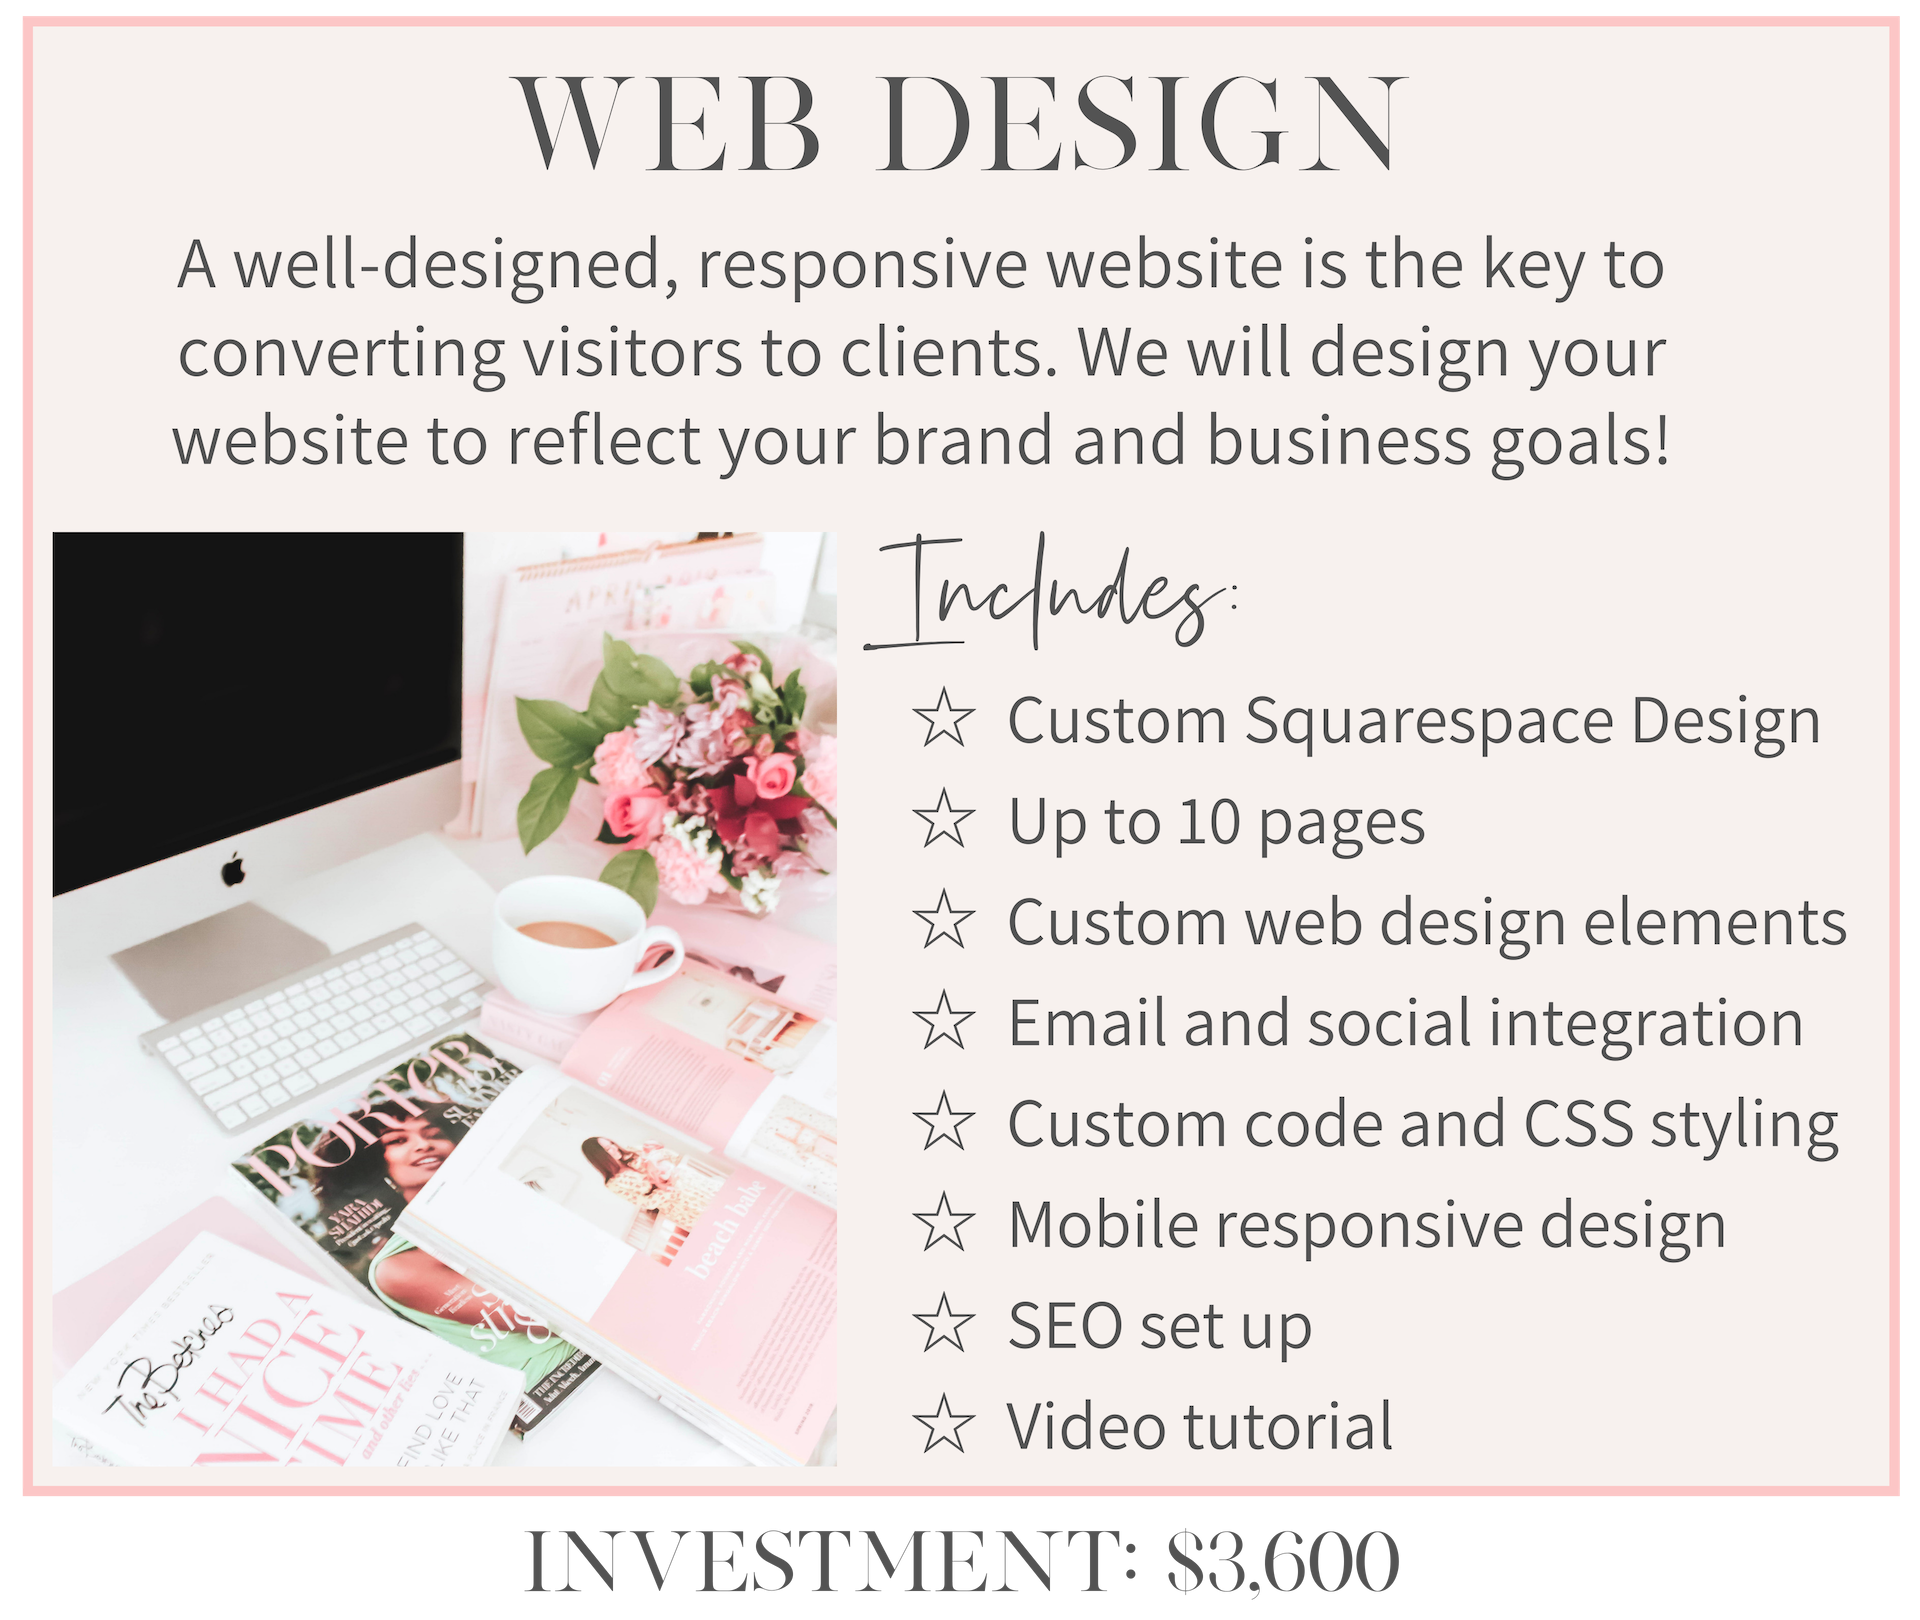 katie mander girlcrush collective website design service